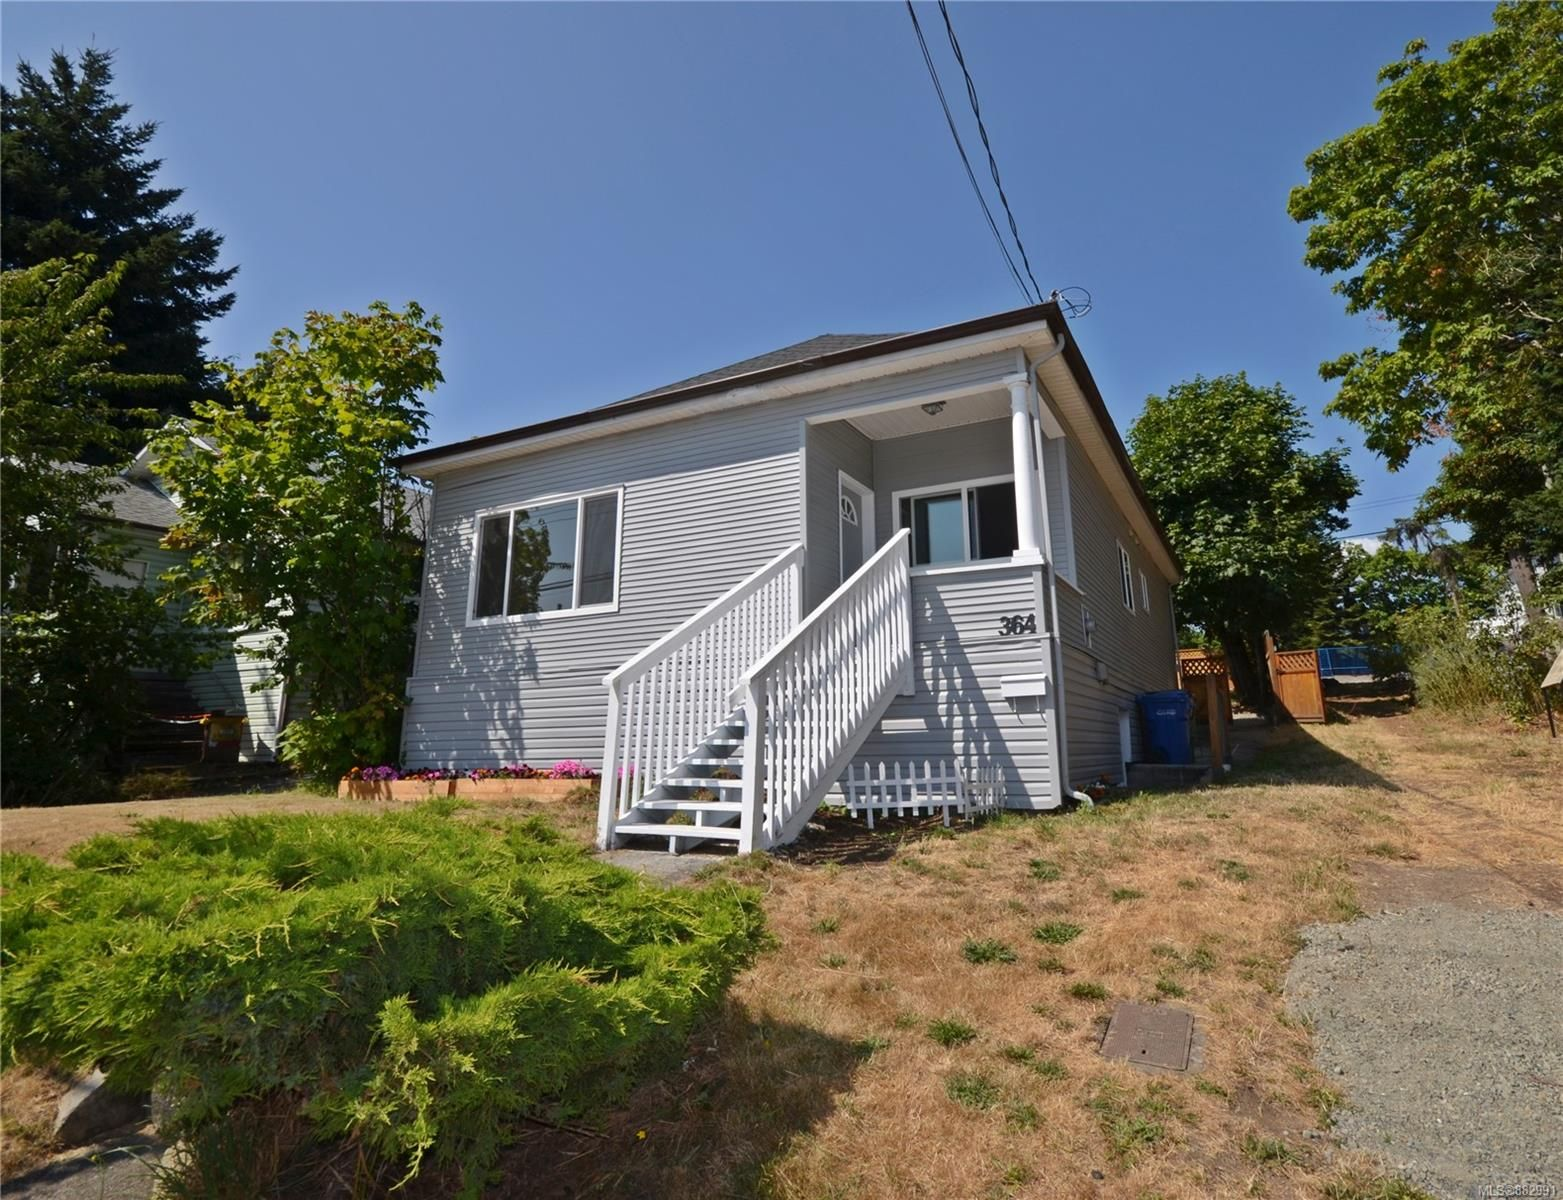 Main Photo: 364 Haliburton St in : Na South Nanaimo House for sale (Nanaimo)  : MLS®# 882991